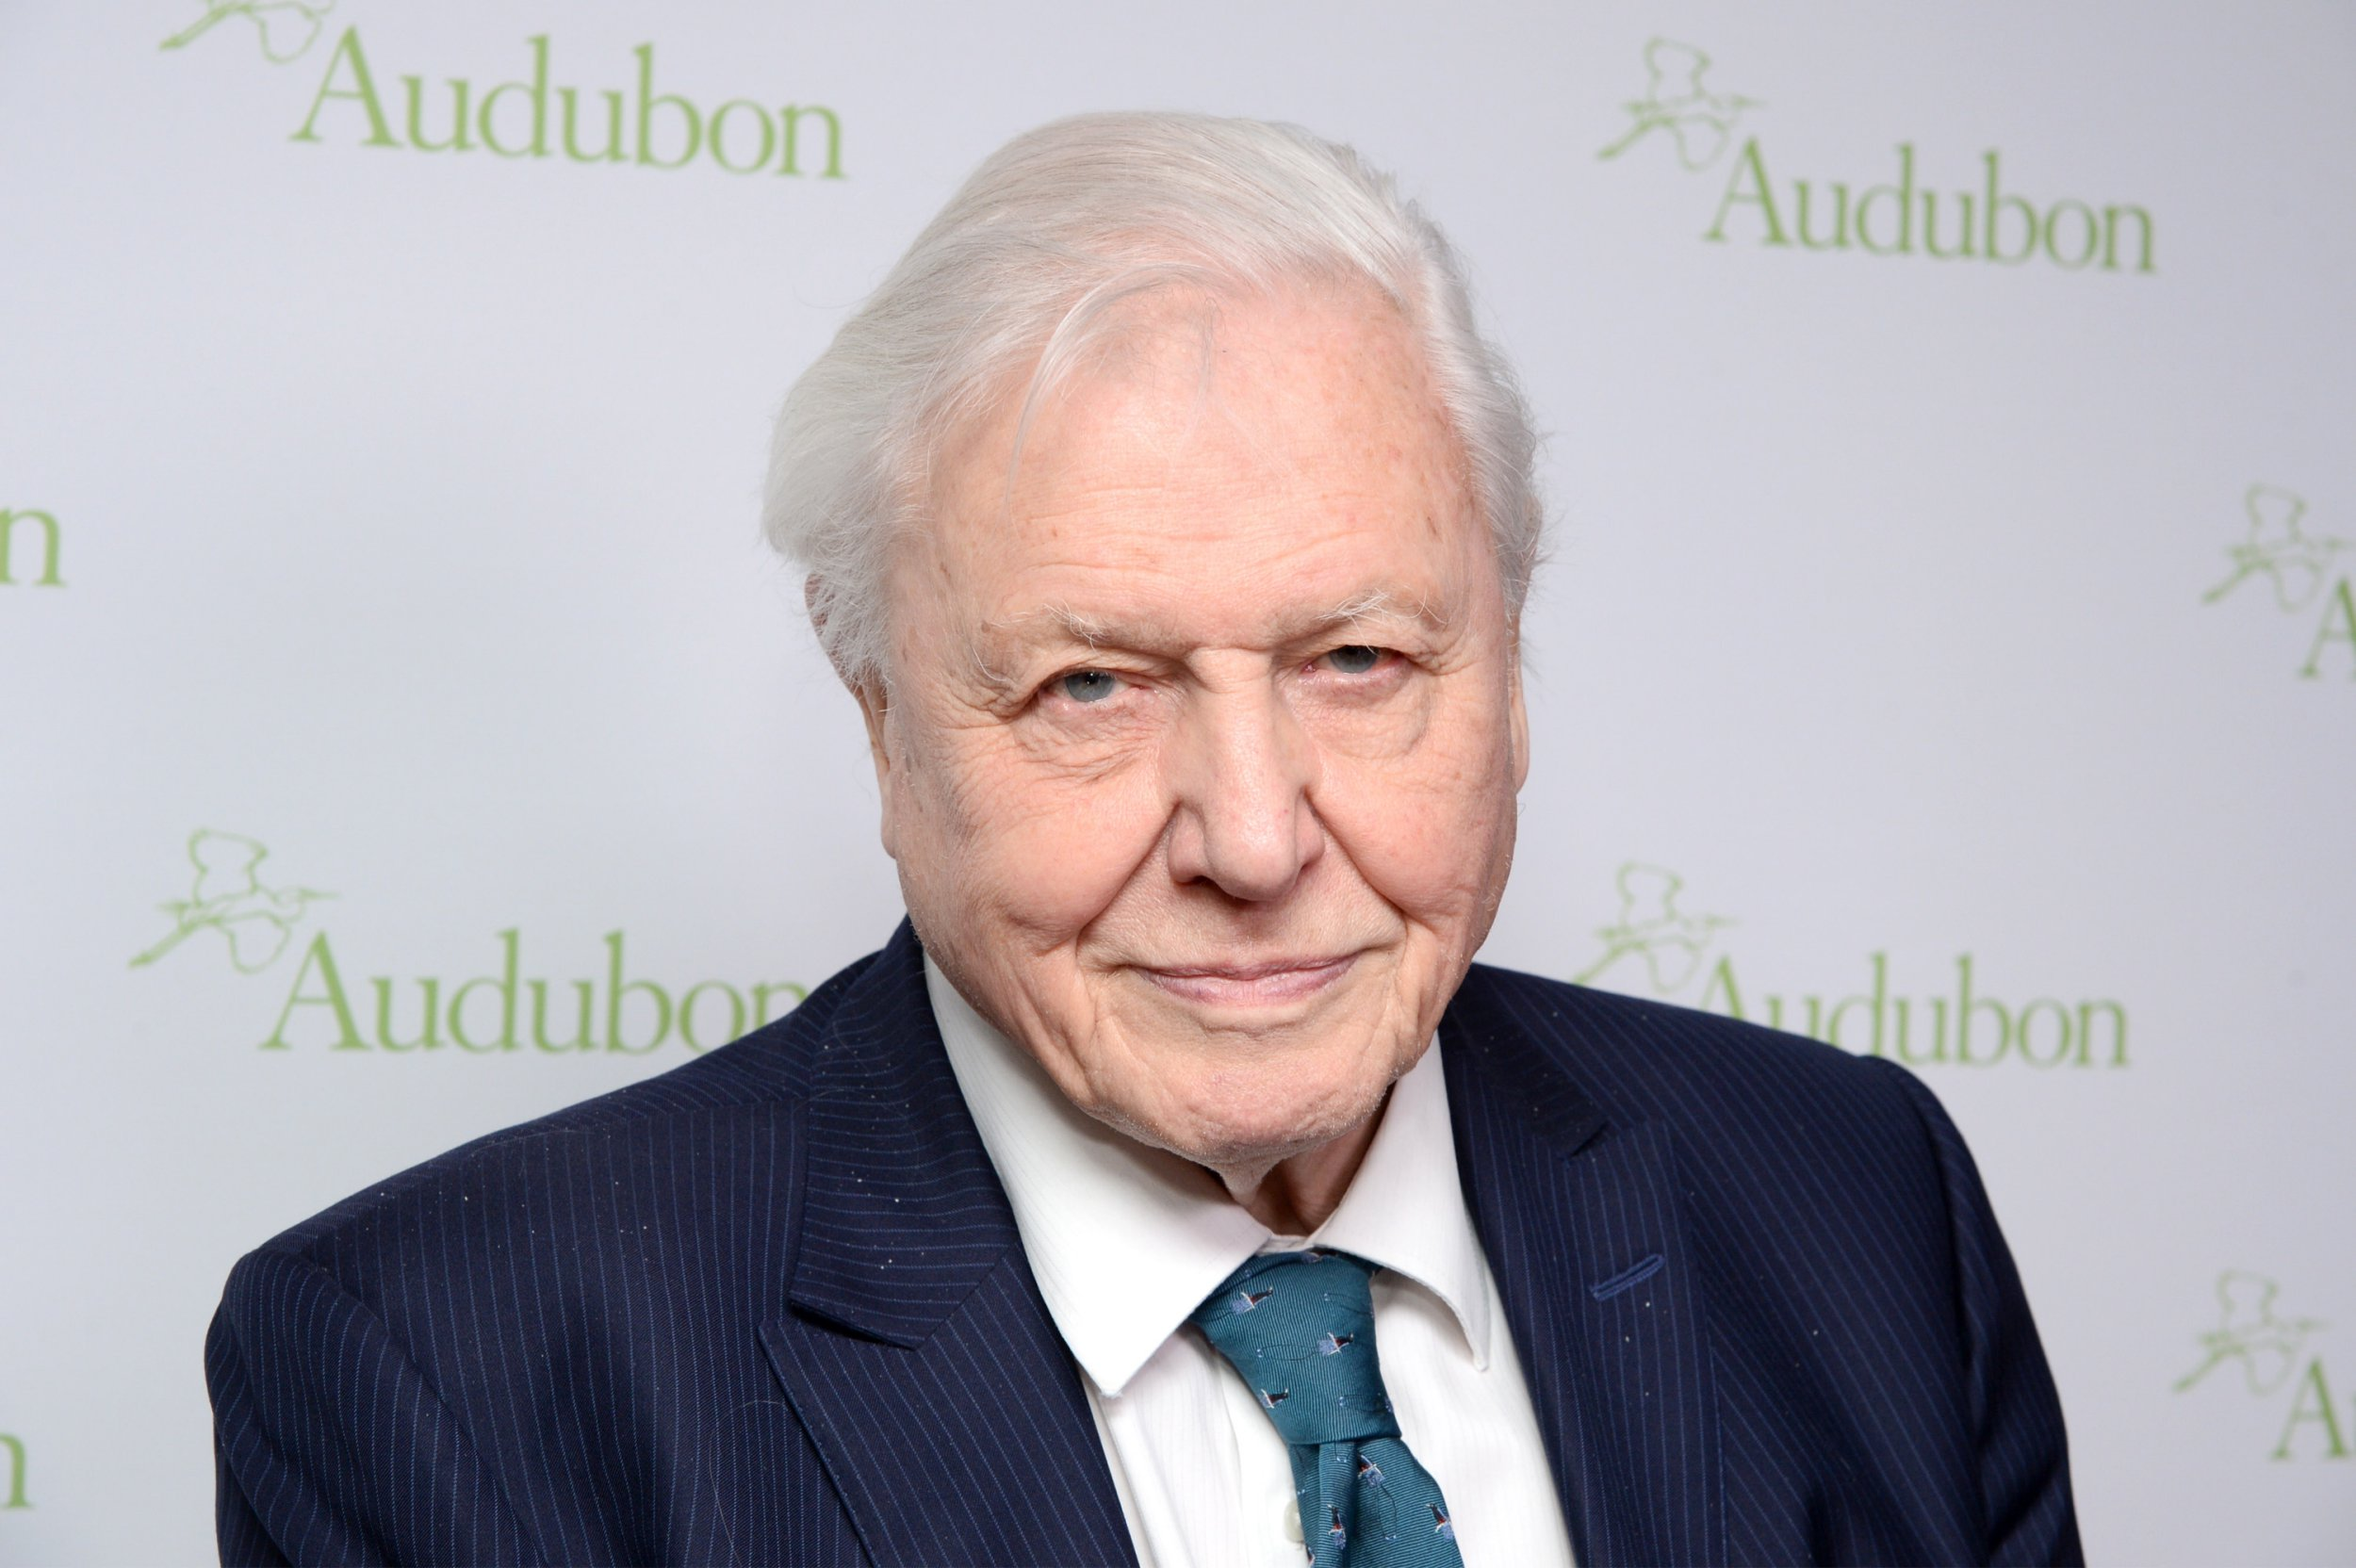 David Attenborough's most inspiring life quotes